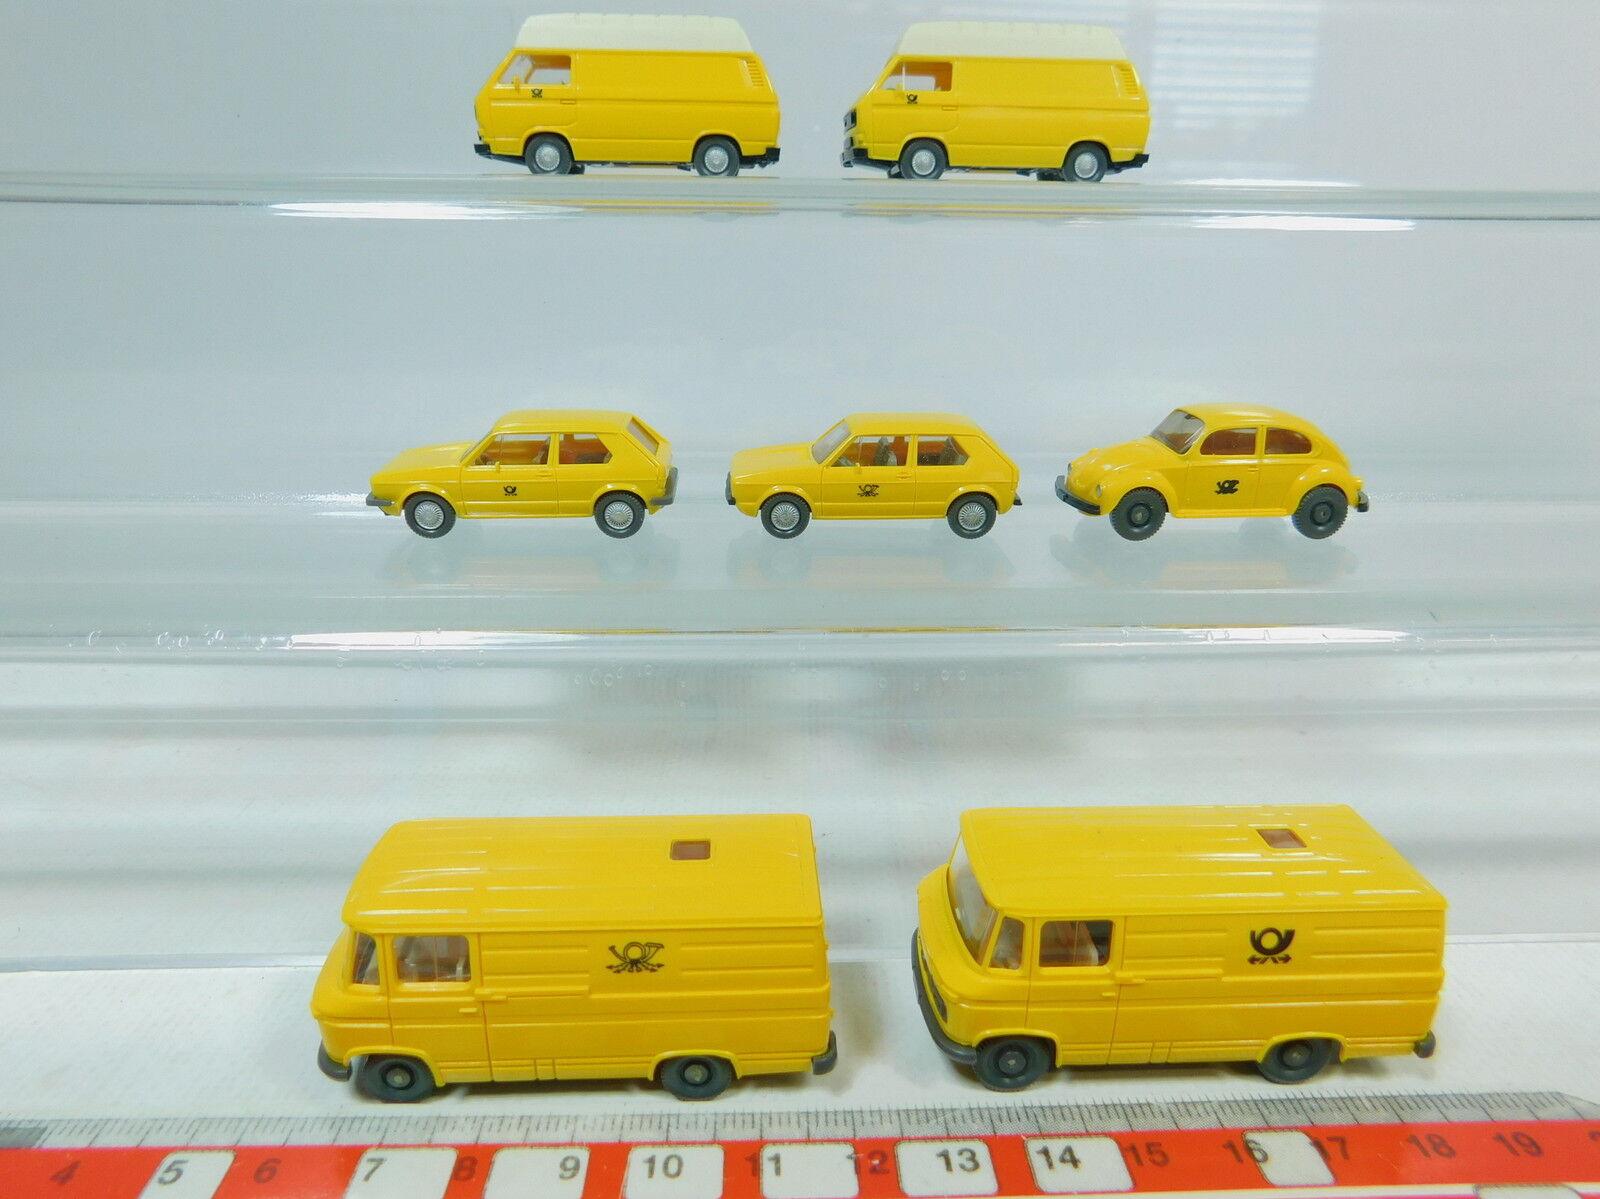 AV171-0, 5 x Wiking H0 post Model  Volkswagen   VW + Mercedes-Benz   MB, Mint